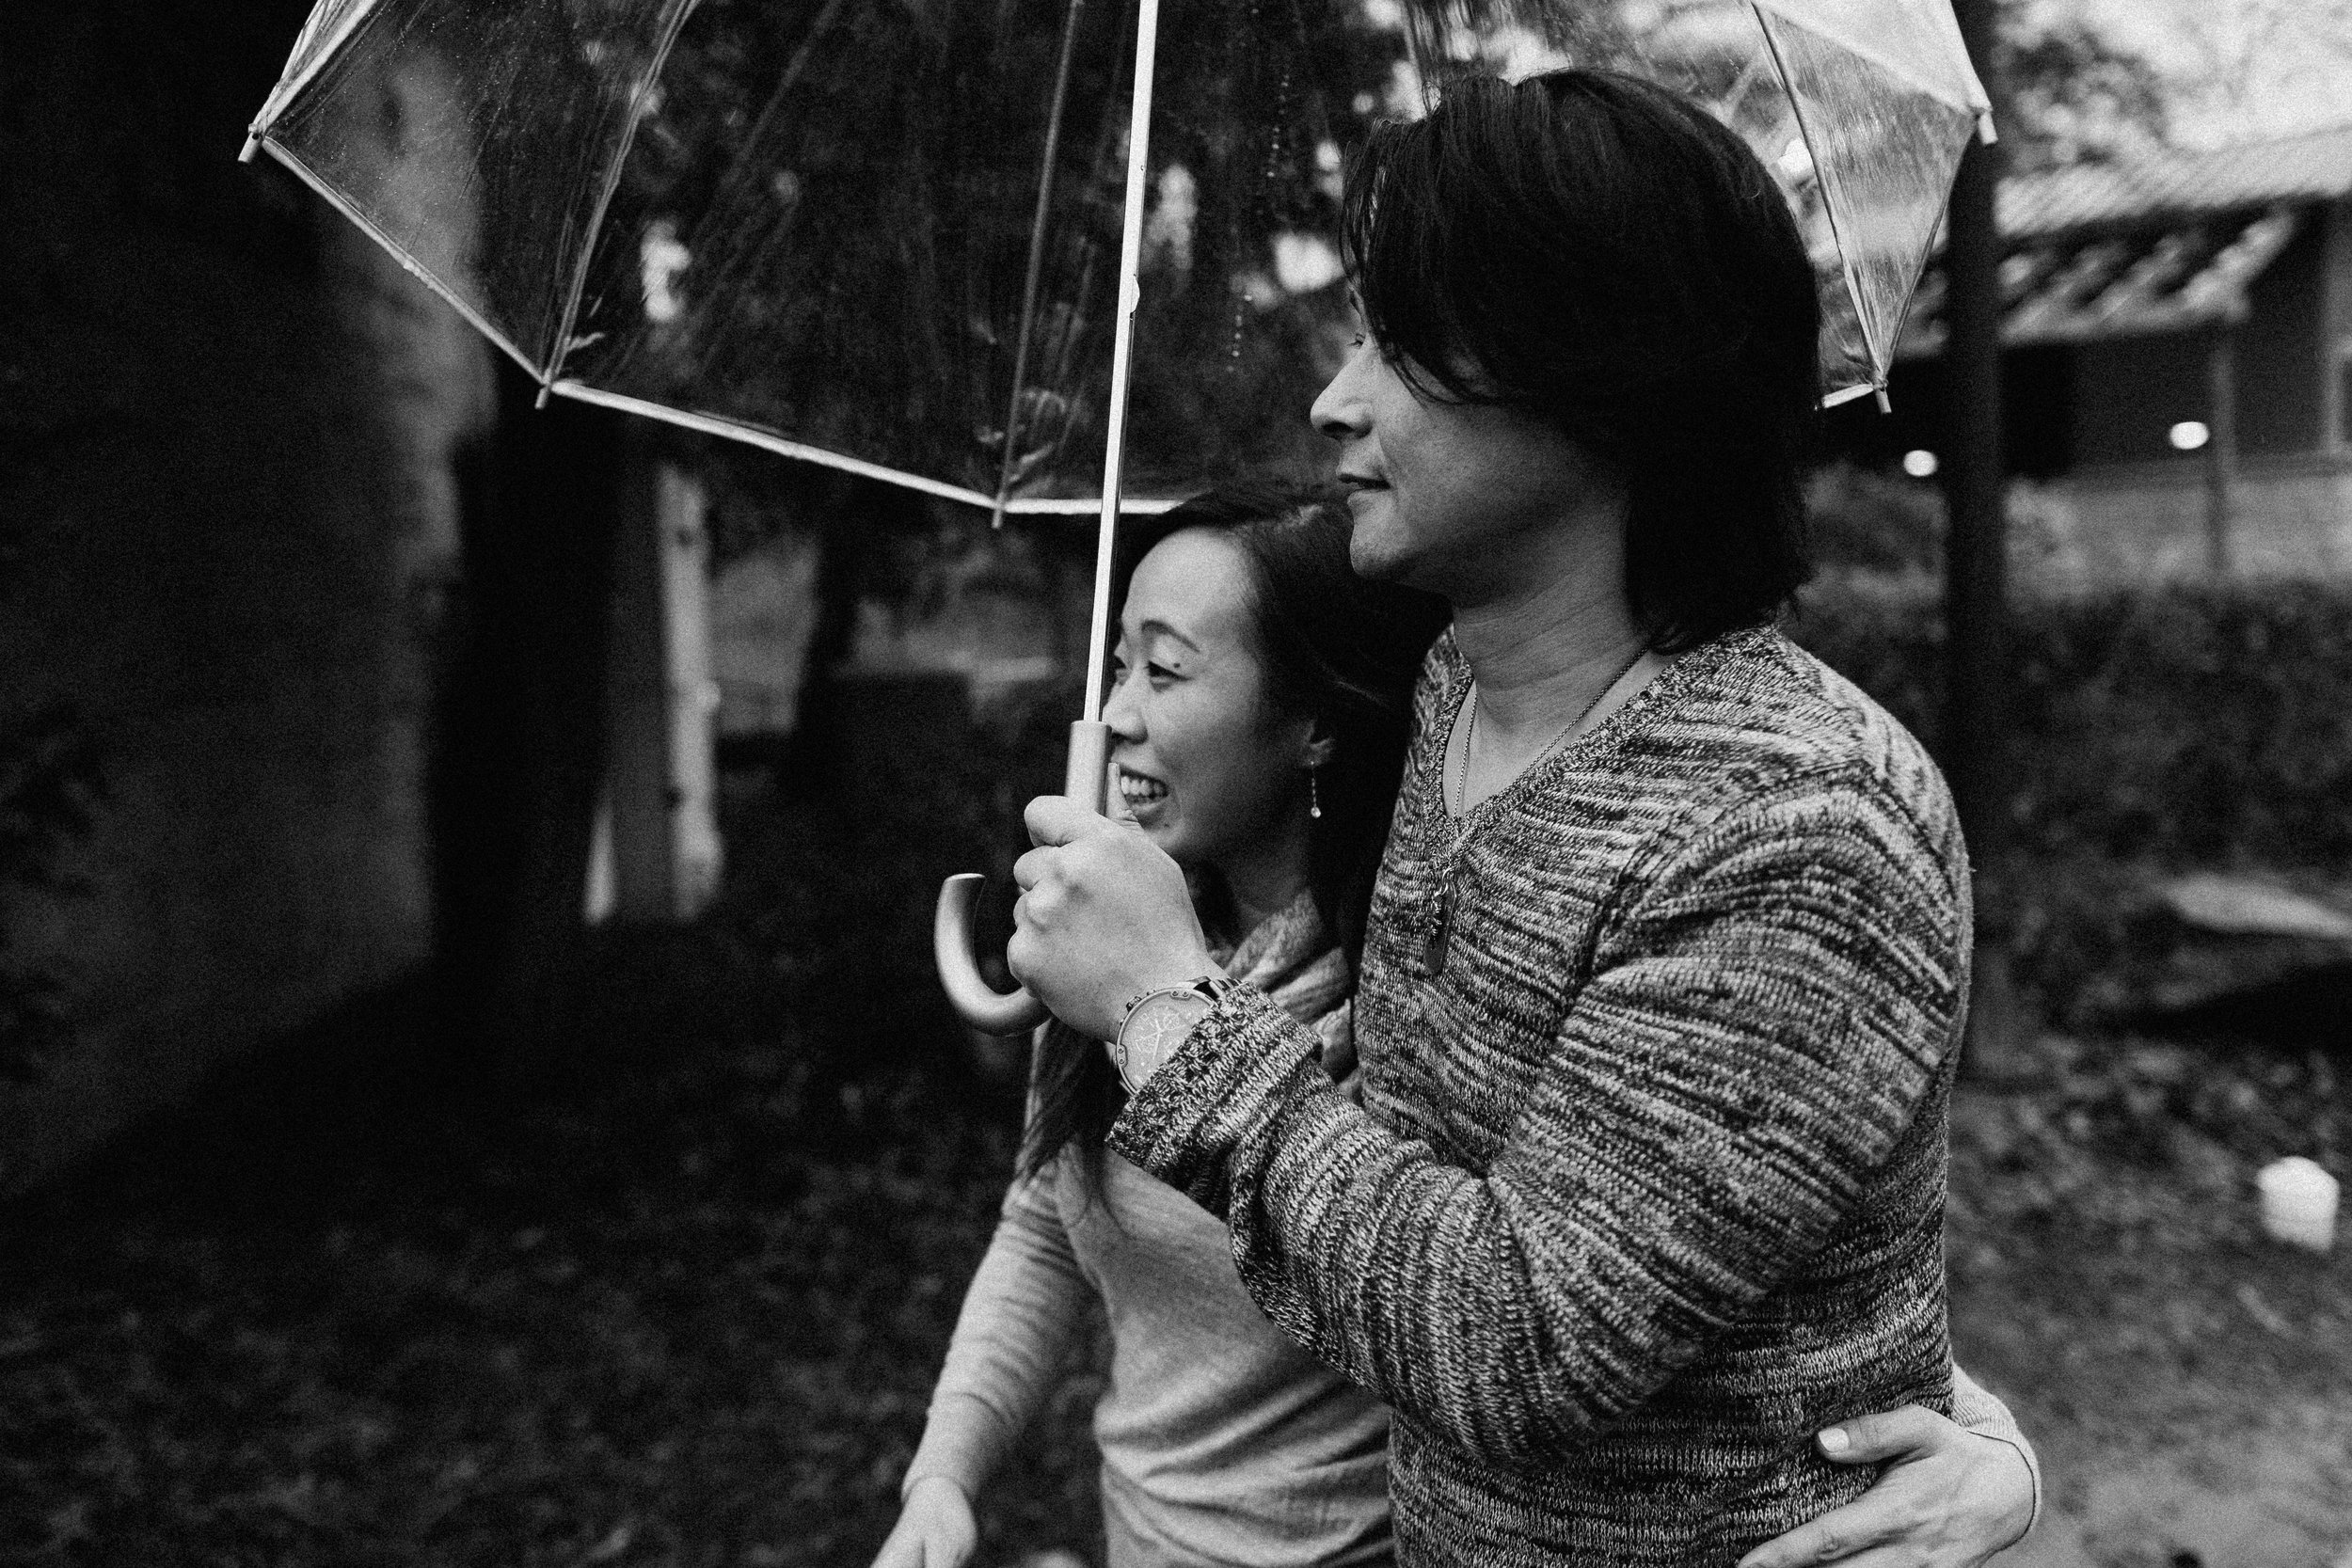 atlanta_gloomy_day_rainy_engagement_couple_lifestyle_fun_playful_artistic_georgia_photographer_2091.jpg